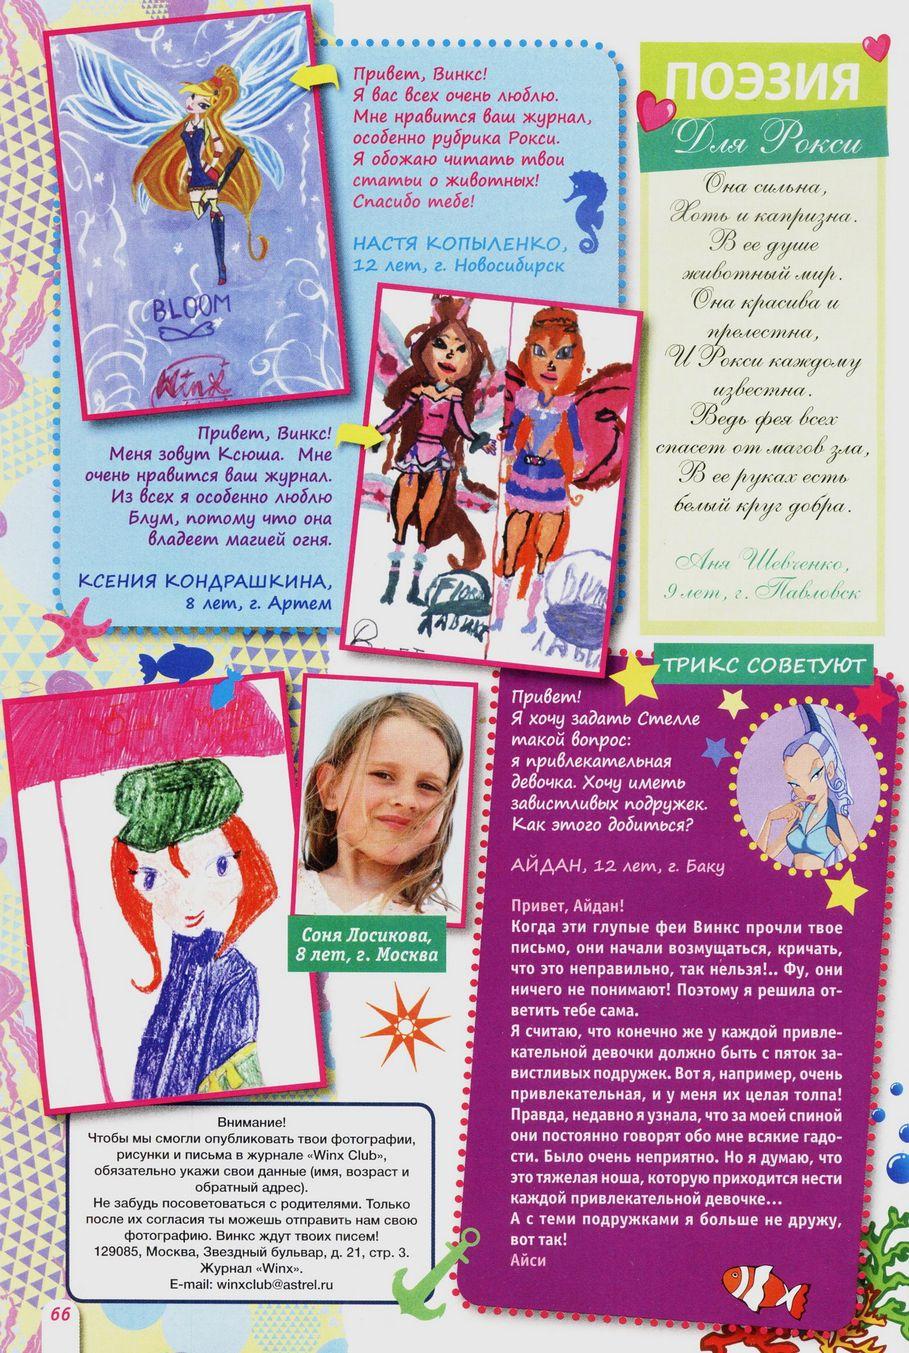 Комикс Винкс Winx - Волшебник Камуд (Журнал Винкс №6 2011) - стр. 66